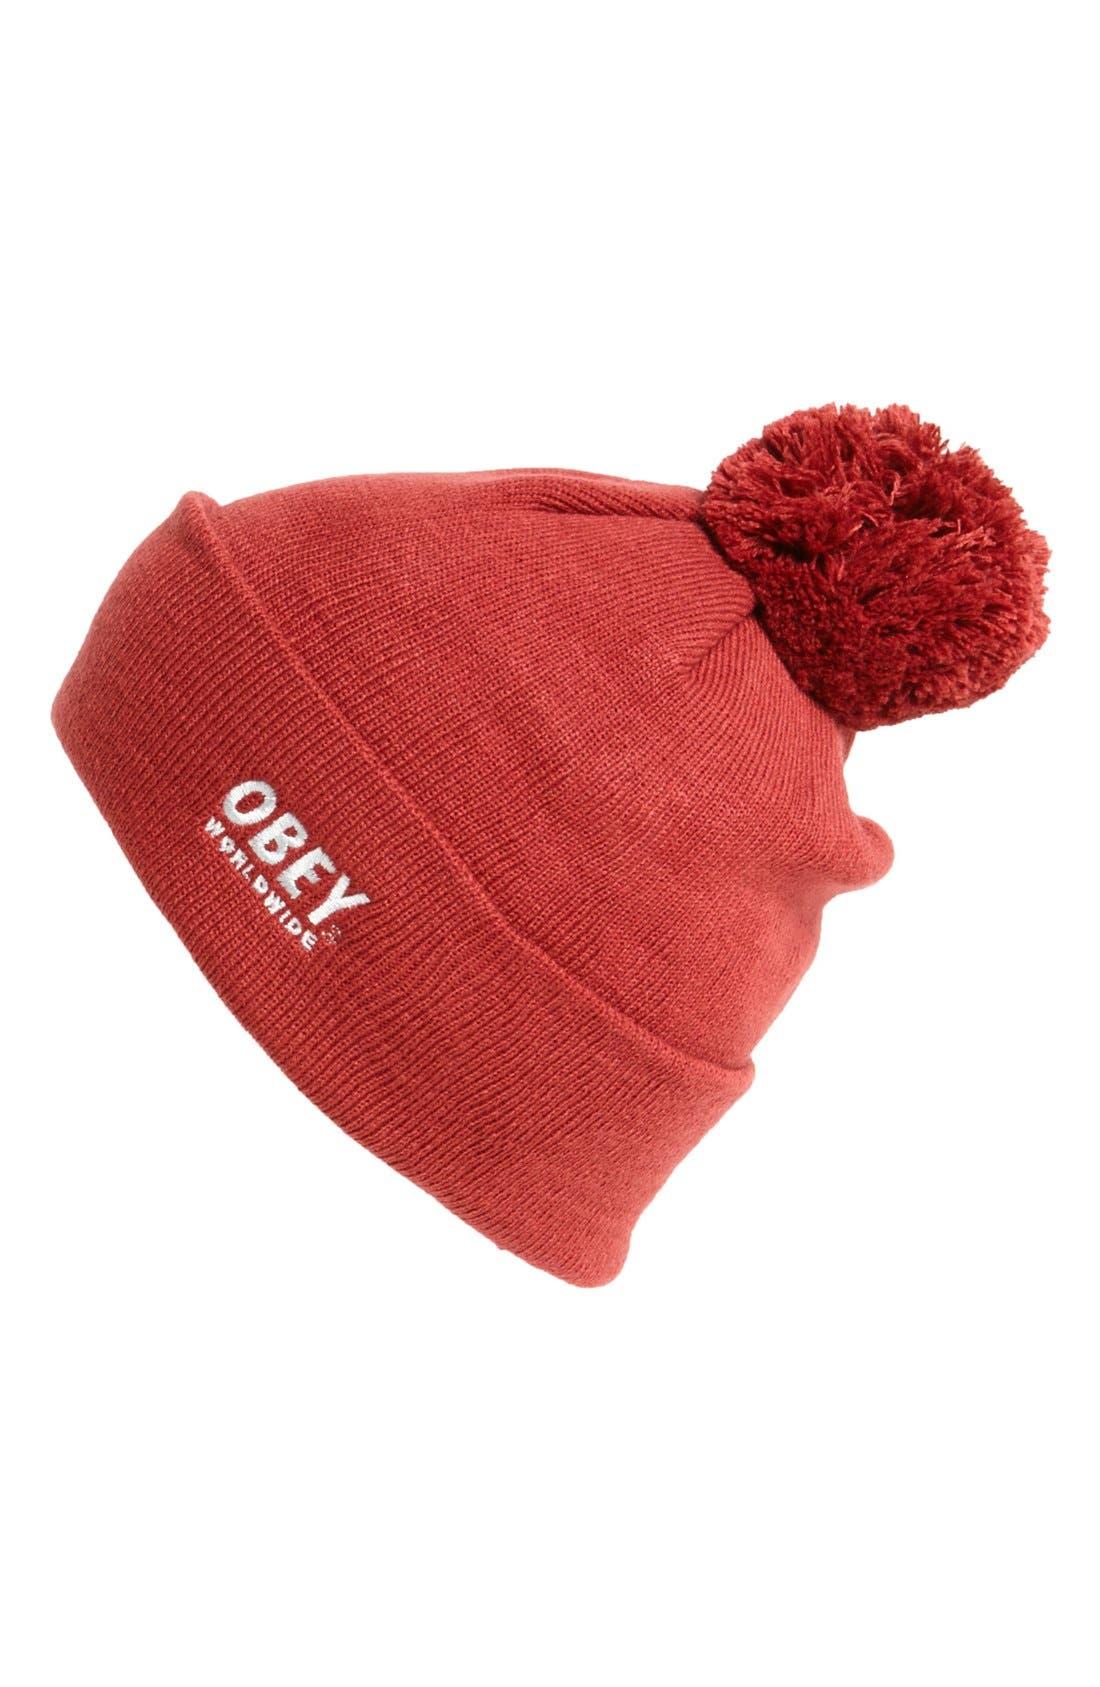 Main Image - Obey 'Worldwide' Pompom Knit Cap